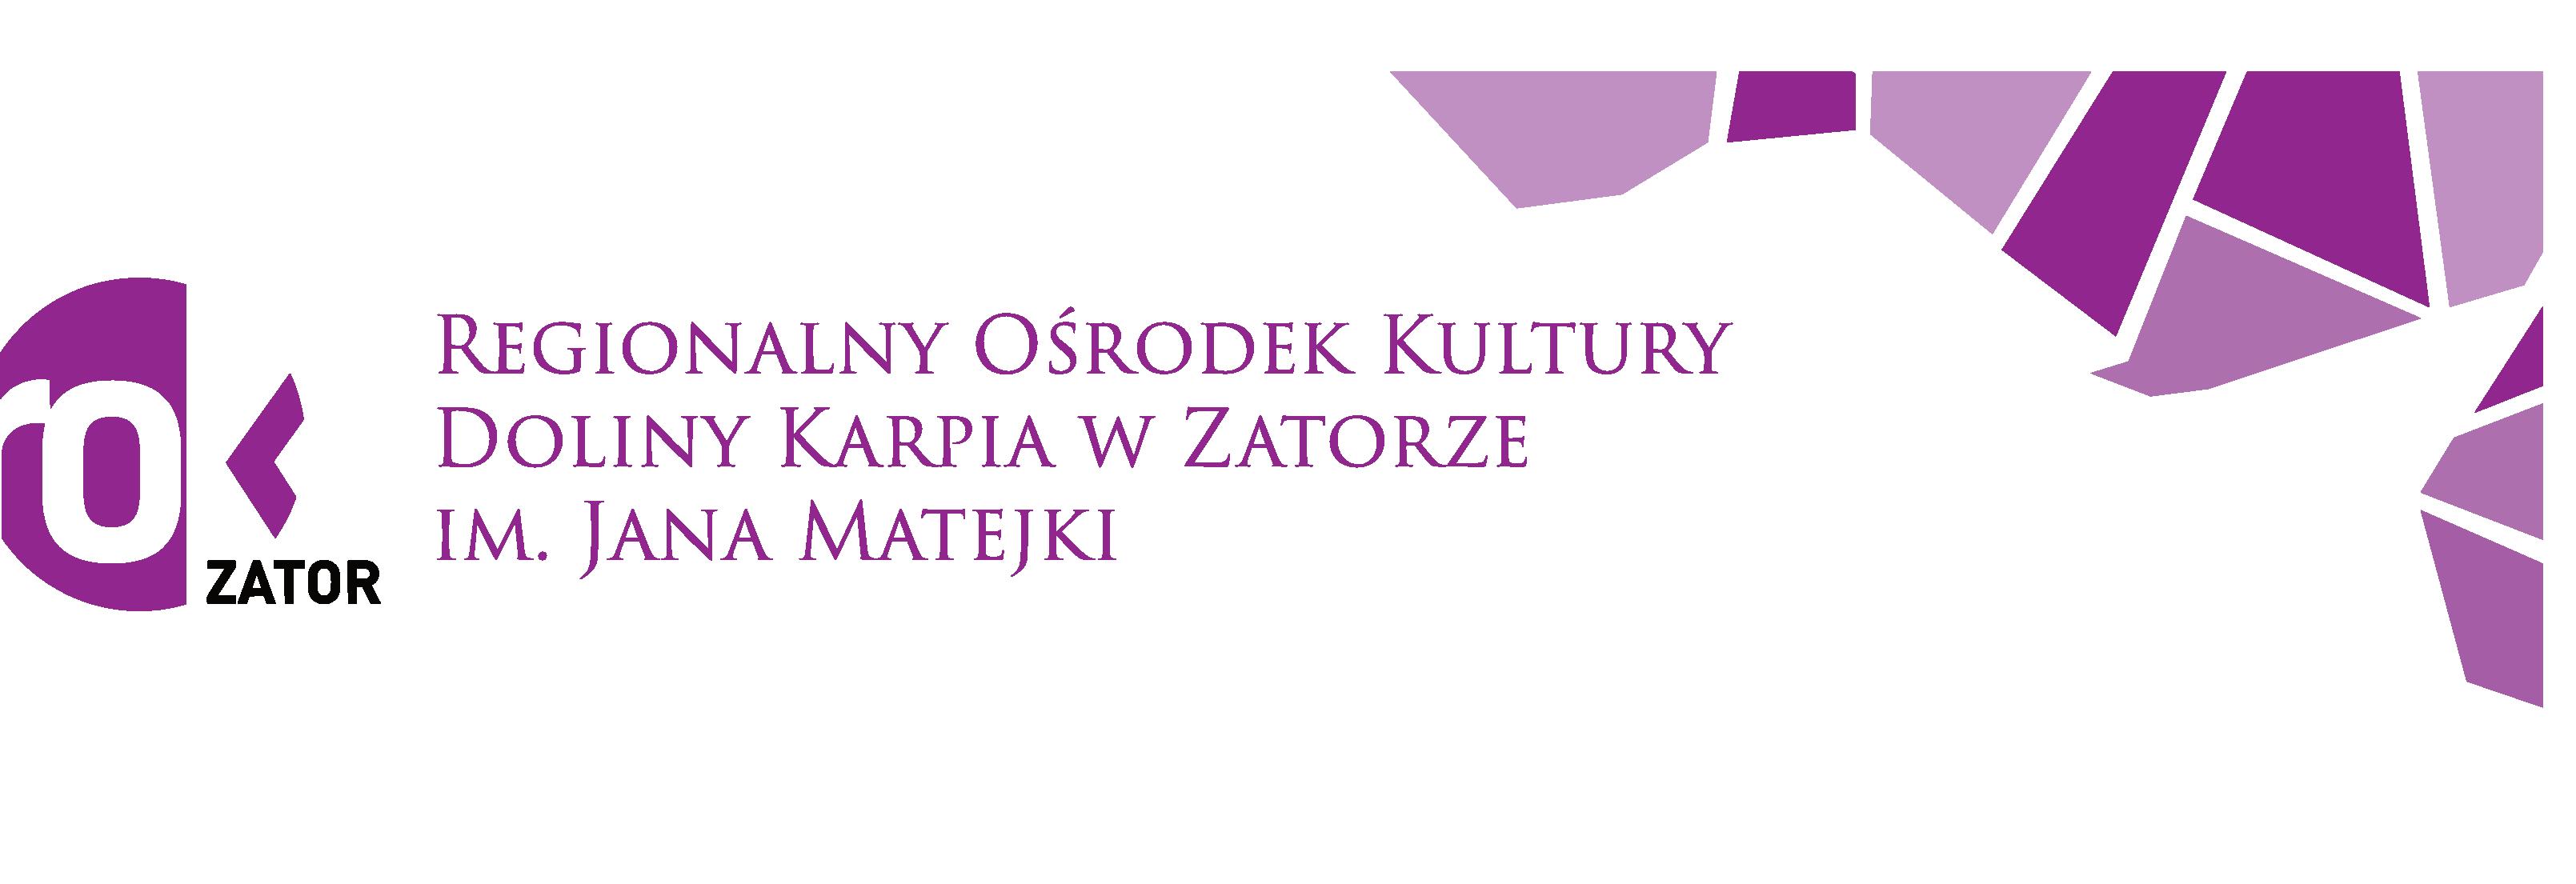 https://rokzator.pl/images/rok-zator-logo-www.png